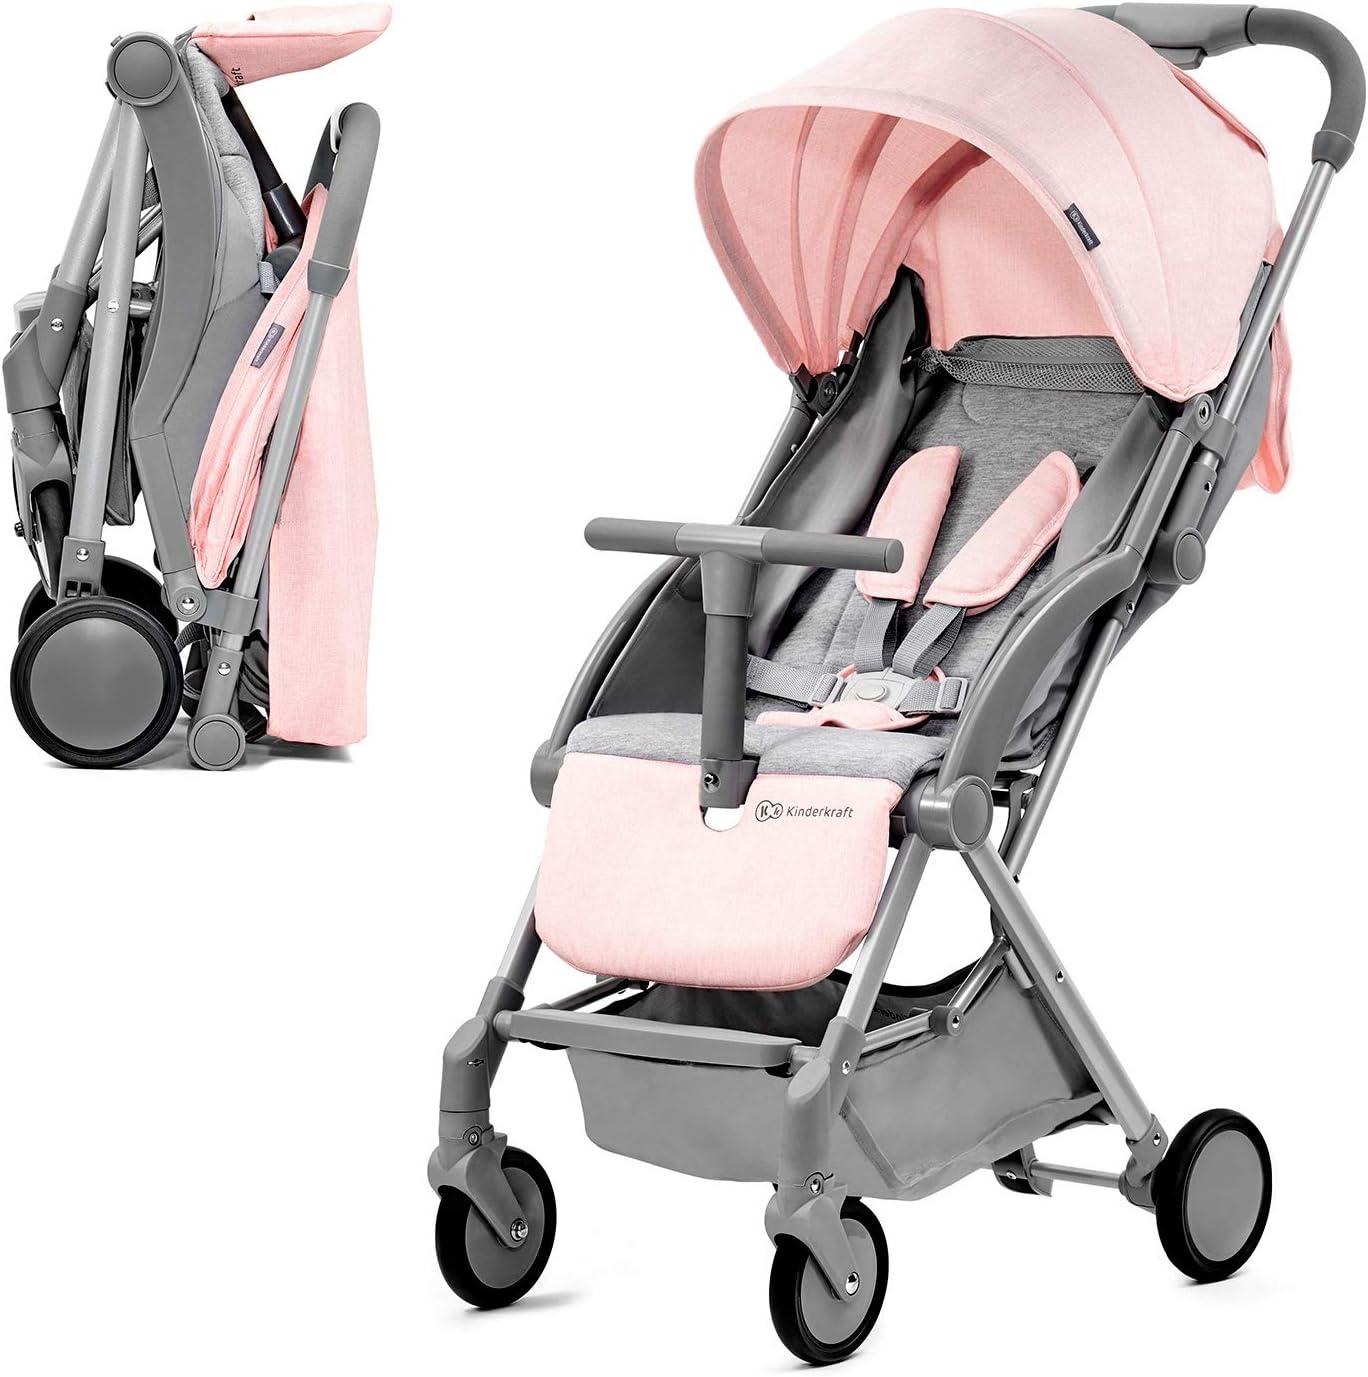 Kinderkraft Silla de Paseo PILOT, Plegable, Transportable, Hasta 15 kg, Rosa